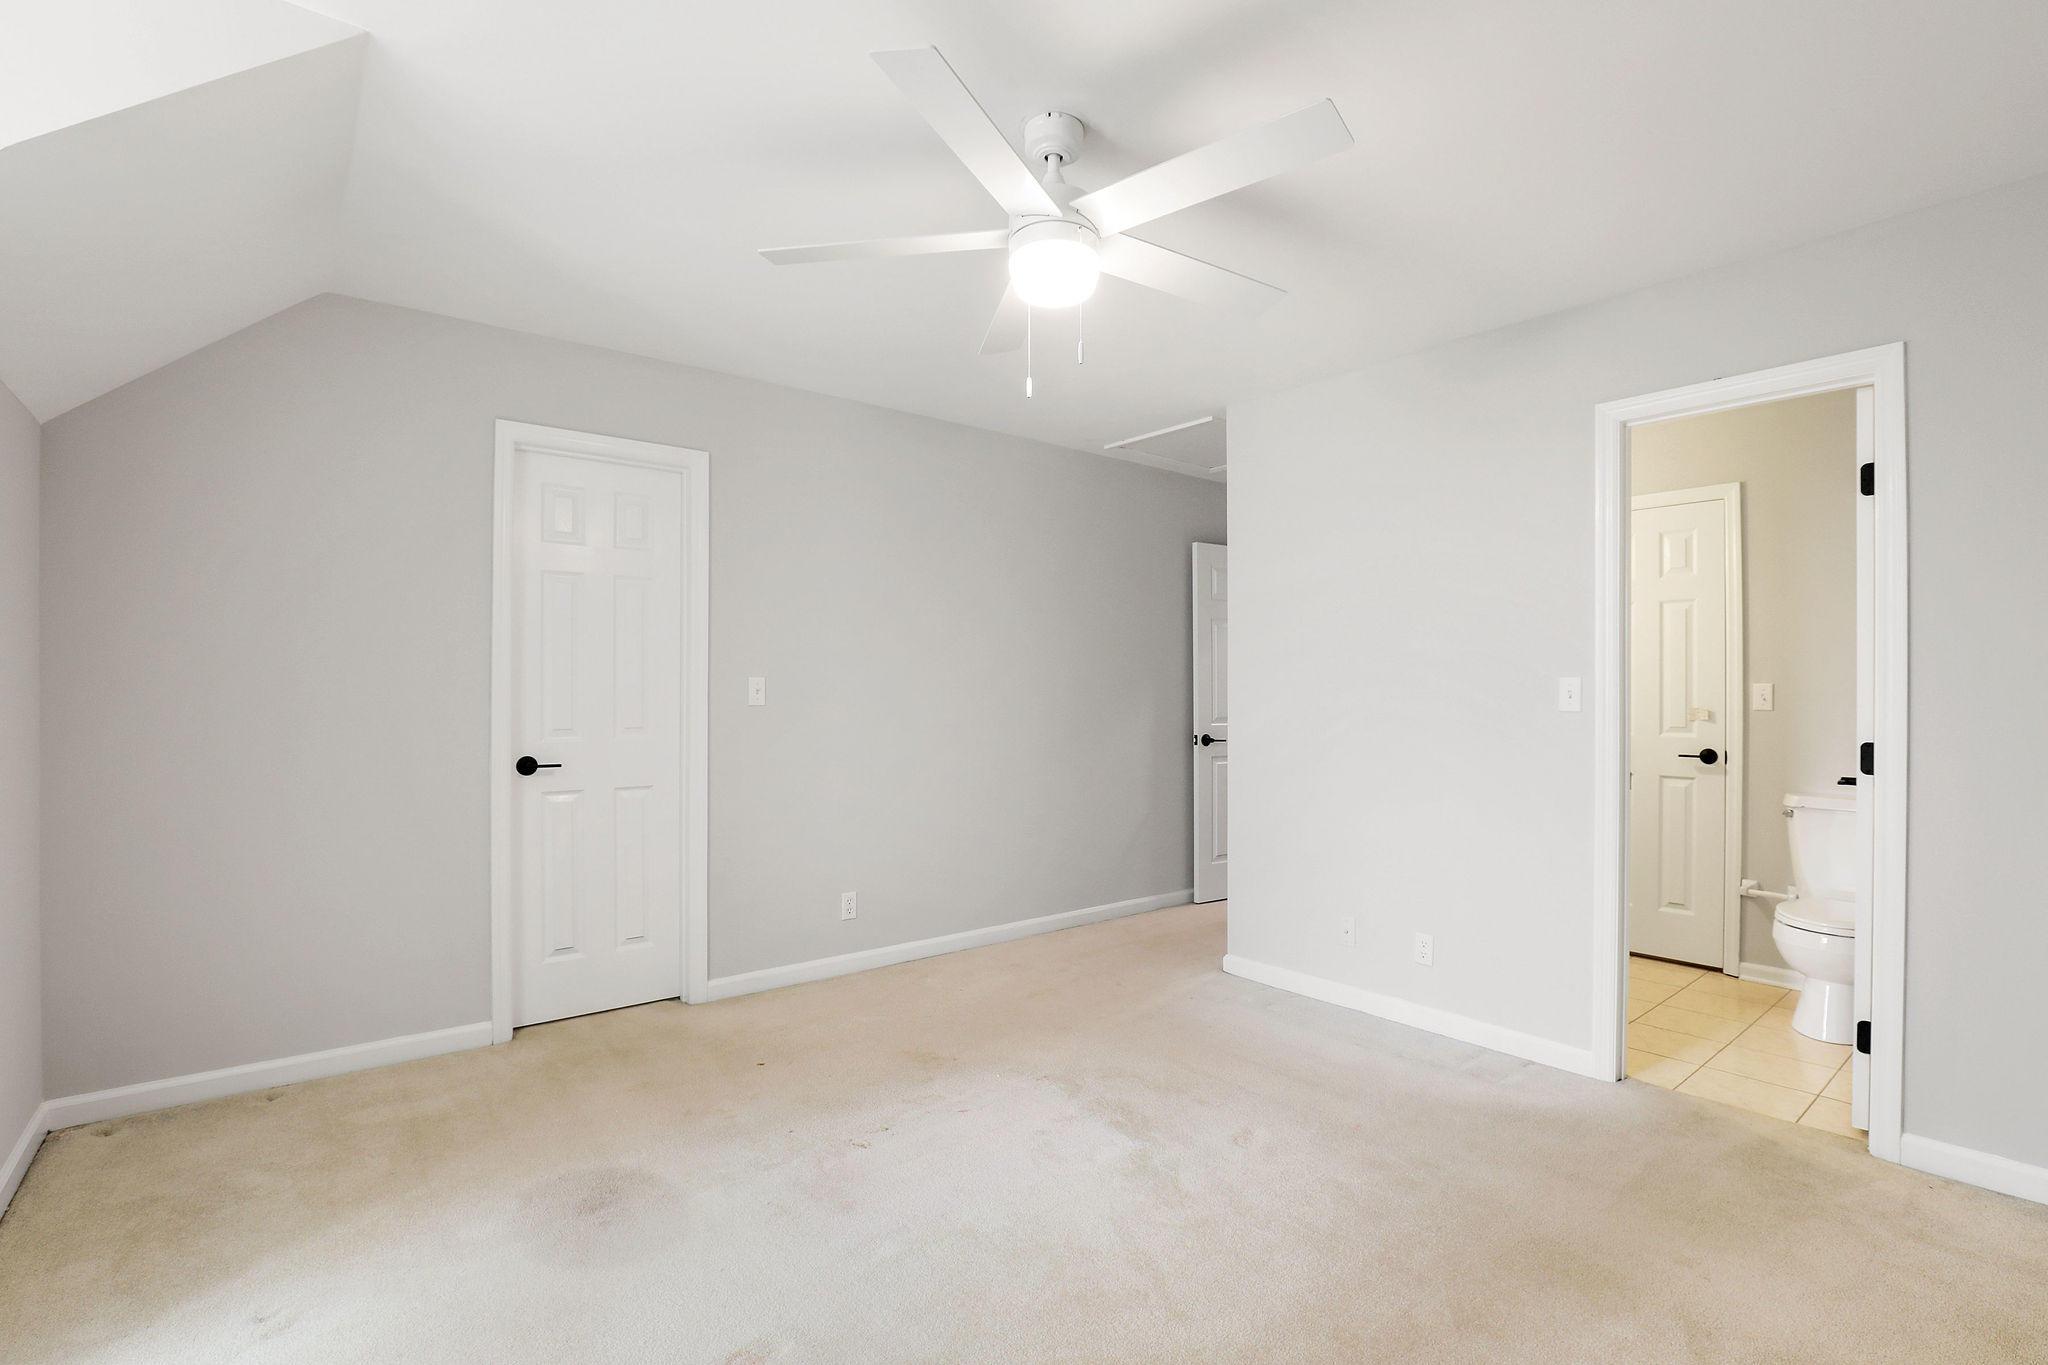 Old Mt Pleasant Homes For Sale - 1417 Edwards, Mount Pleasant, SC - 11